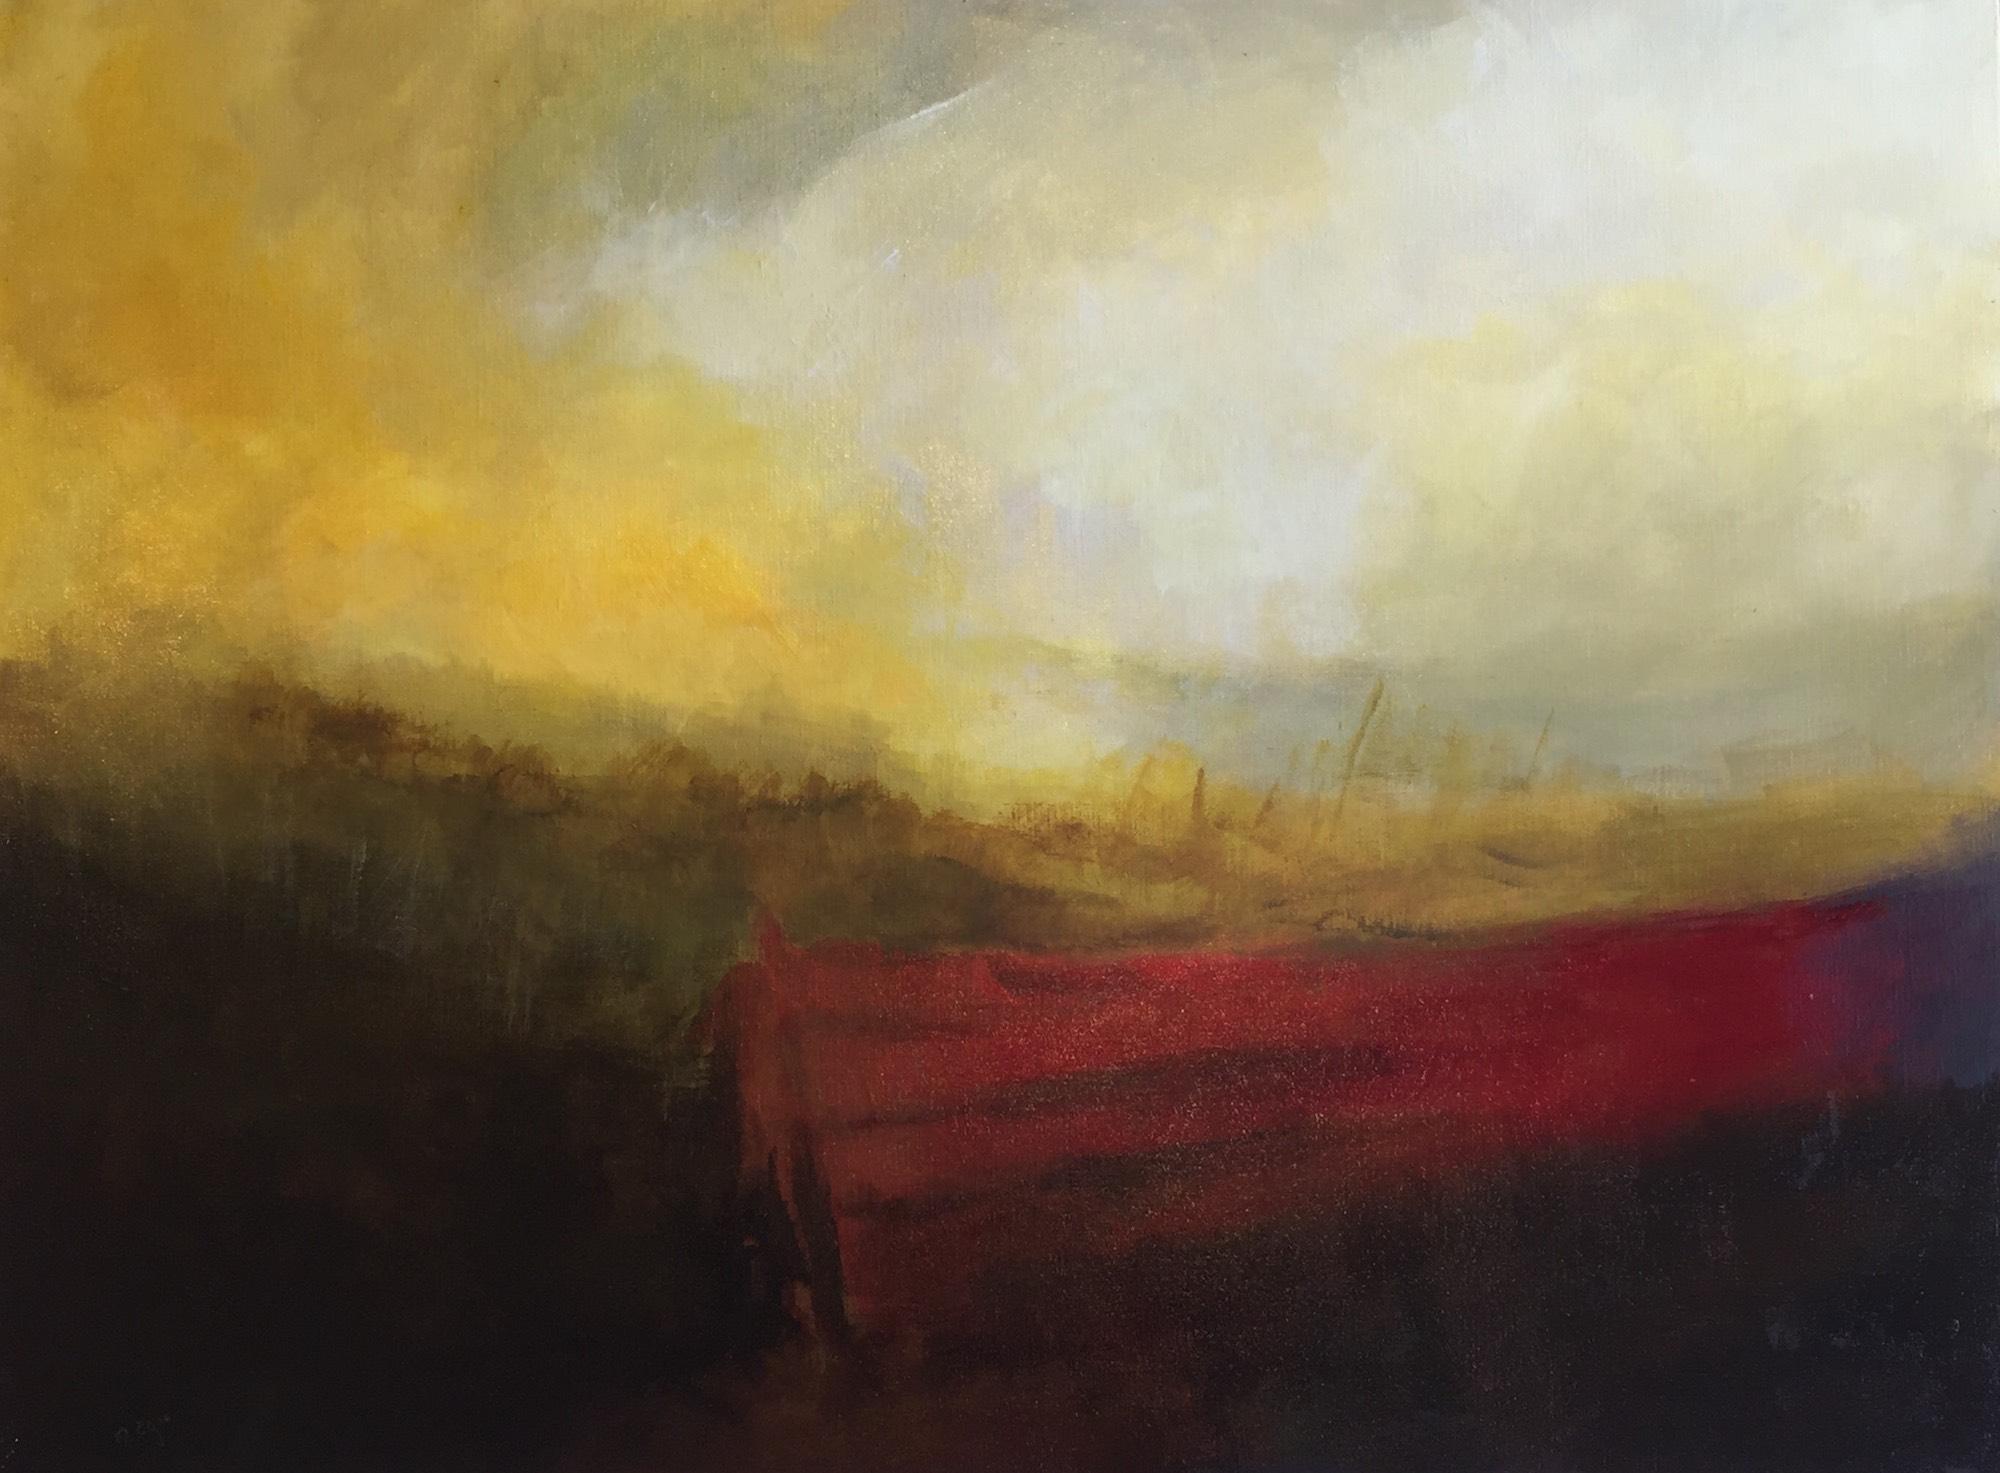 Margaret Egan, Red Boat, acrylic on linen, 76x110cm